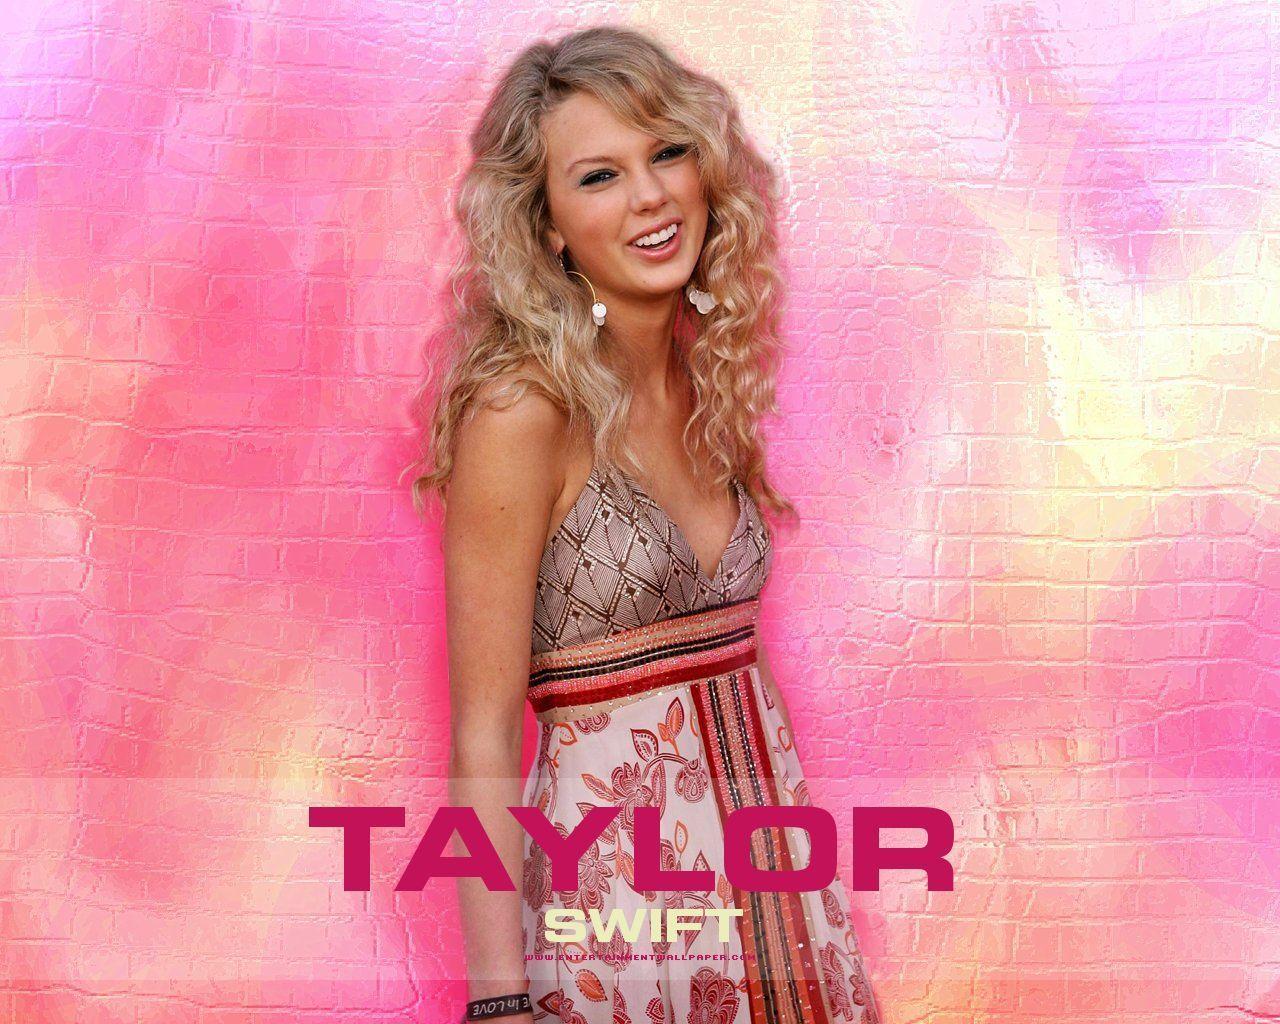 wallpapers ts   Taylor Swift Wallpaper 10687132 1280x1024